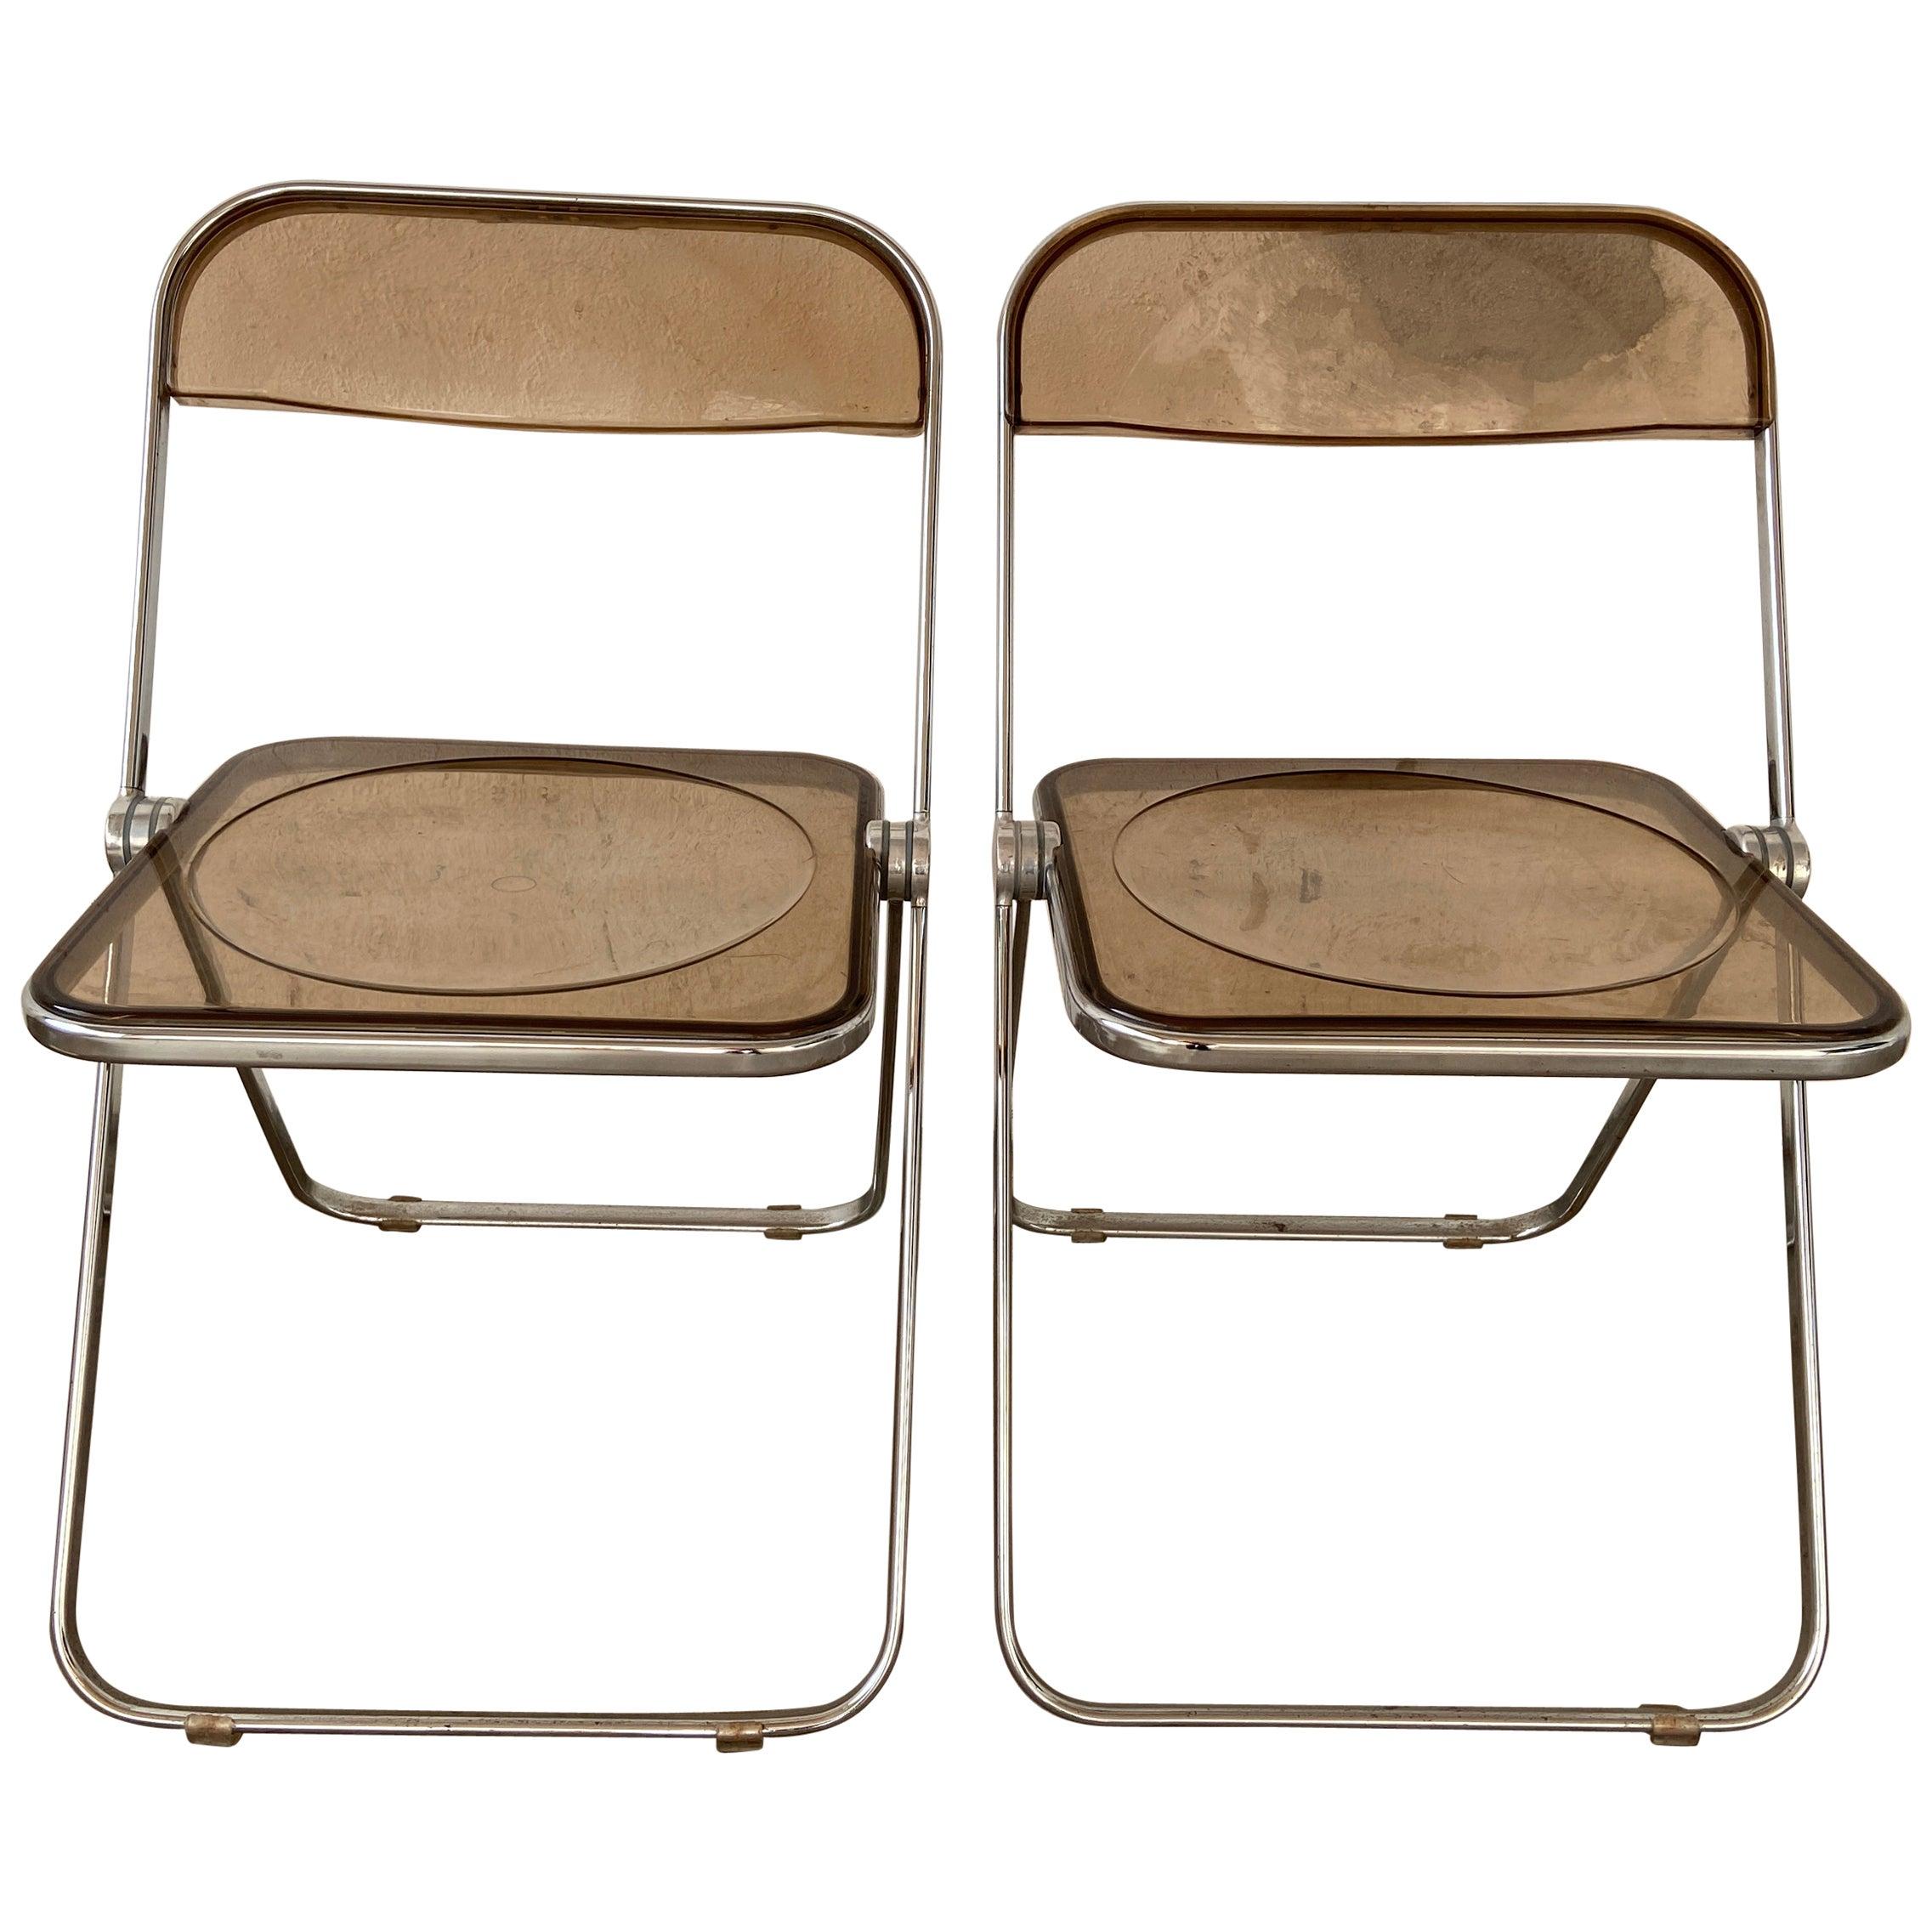 "Mid-Century Modern Italian Pair of Giancarlo Piretti ""Plia"" Folding Chairs 1970s"